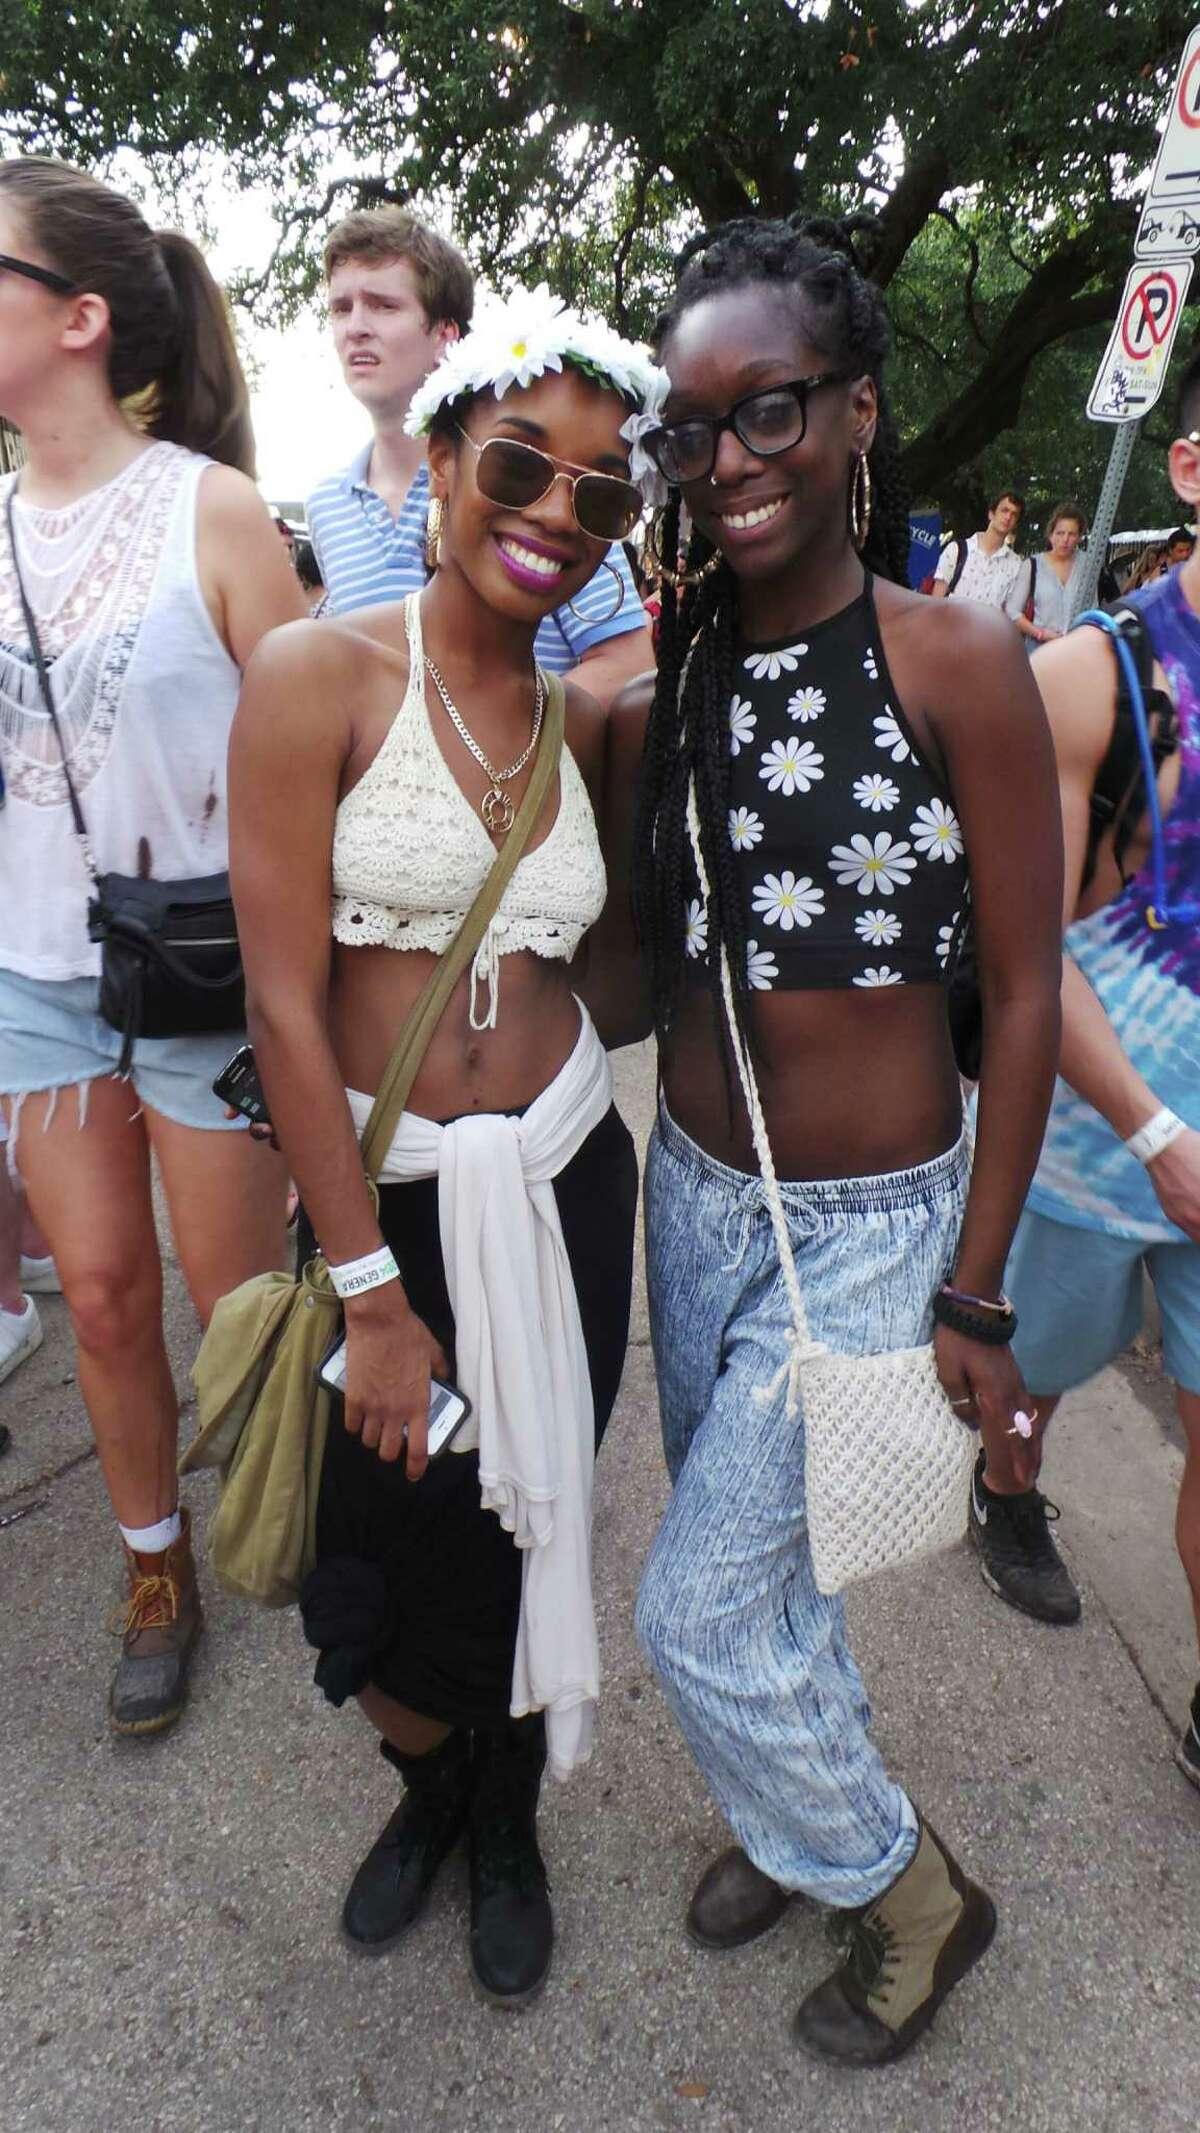 Chenzirah Hemphill and Jasmine Riggs at Free Press Summer Festival 2014 on Saturday, May 31.